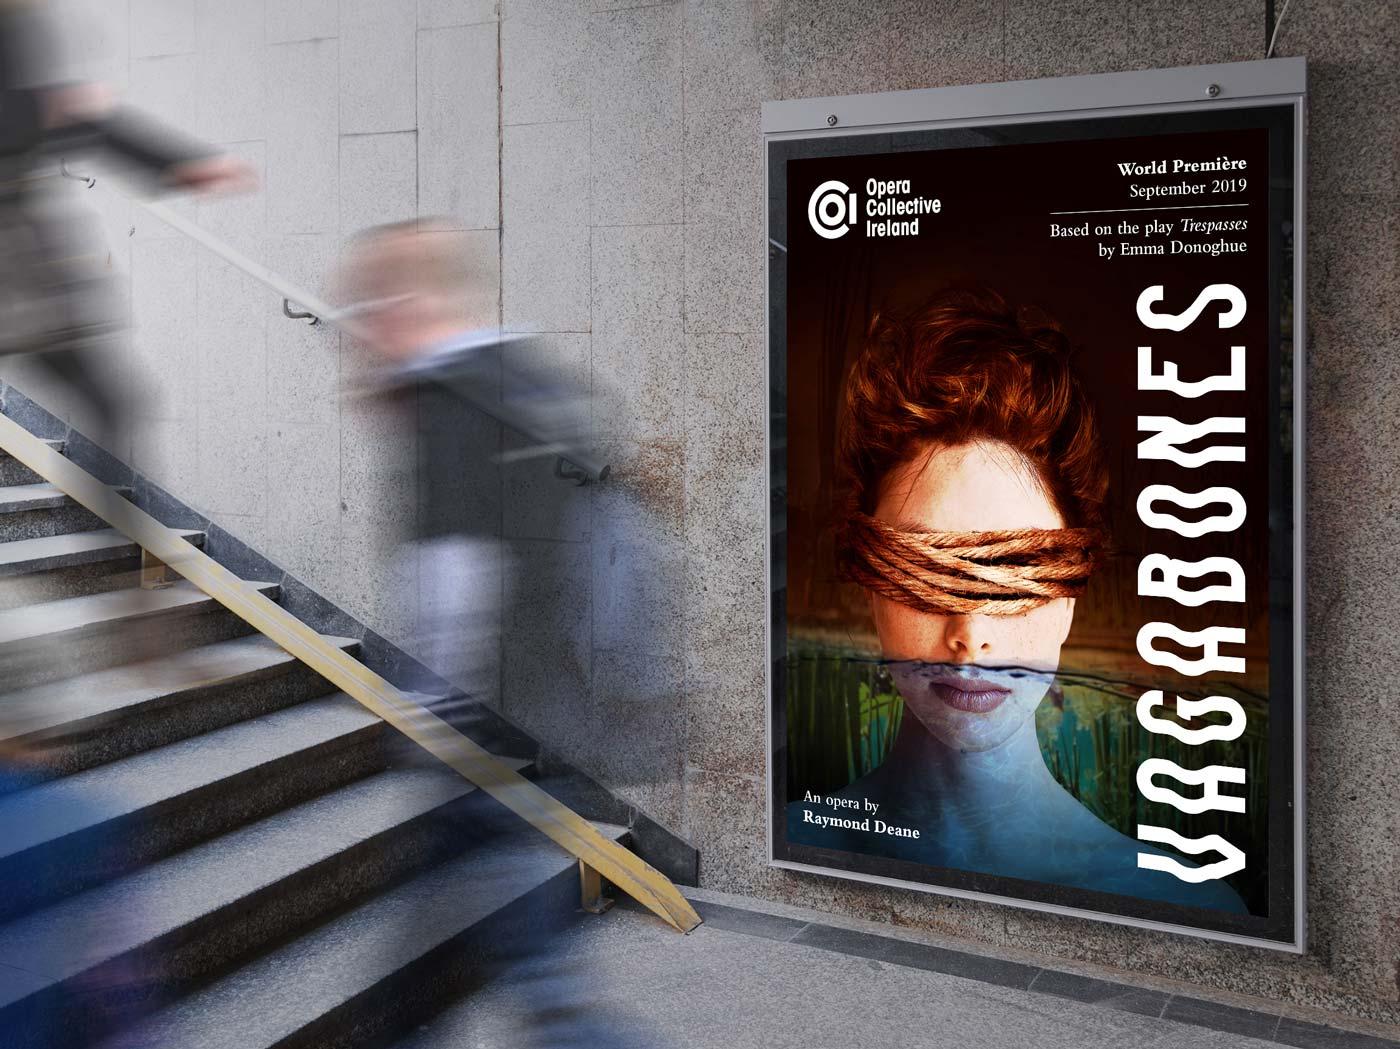 Vagabones, 2019 – Opera Collective Ireland (OCI) – Marketing visual